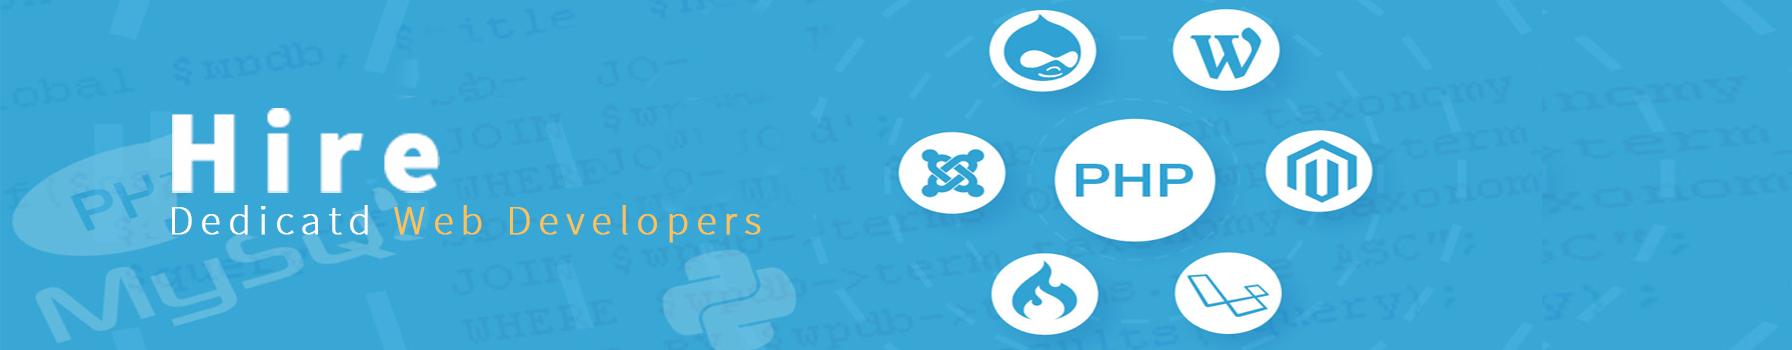 hire-dedicated-web-developer.png